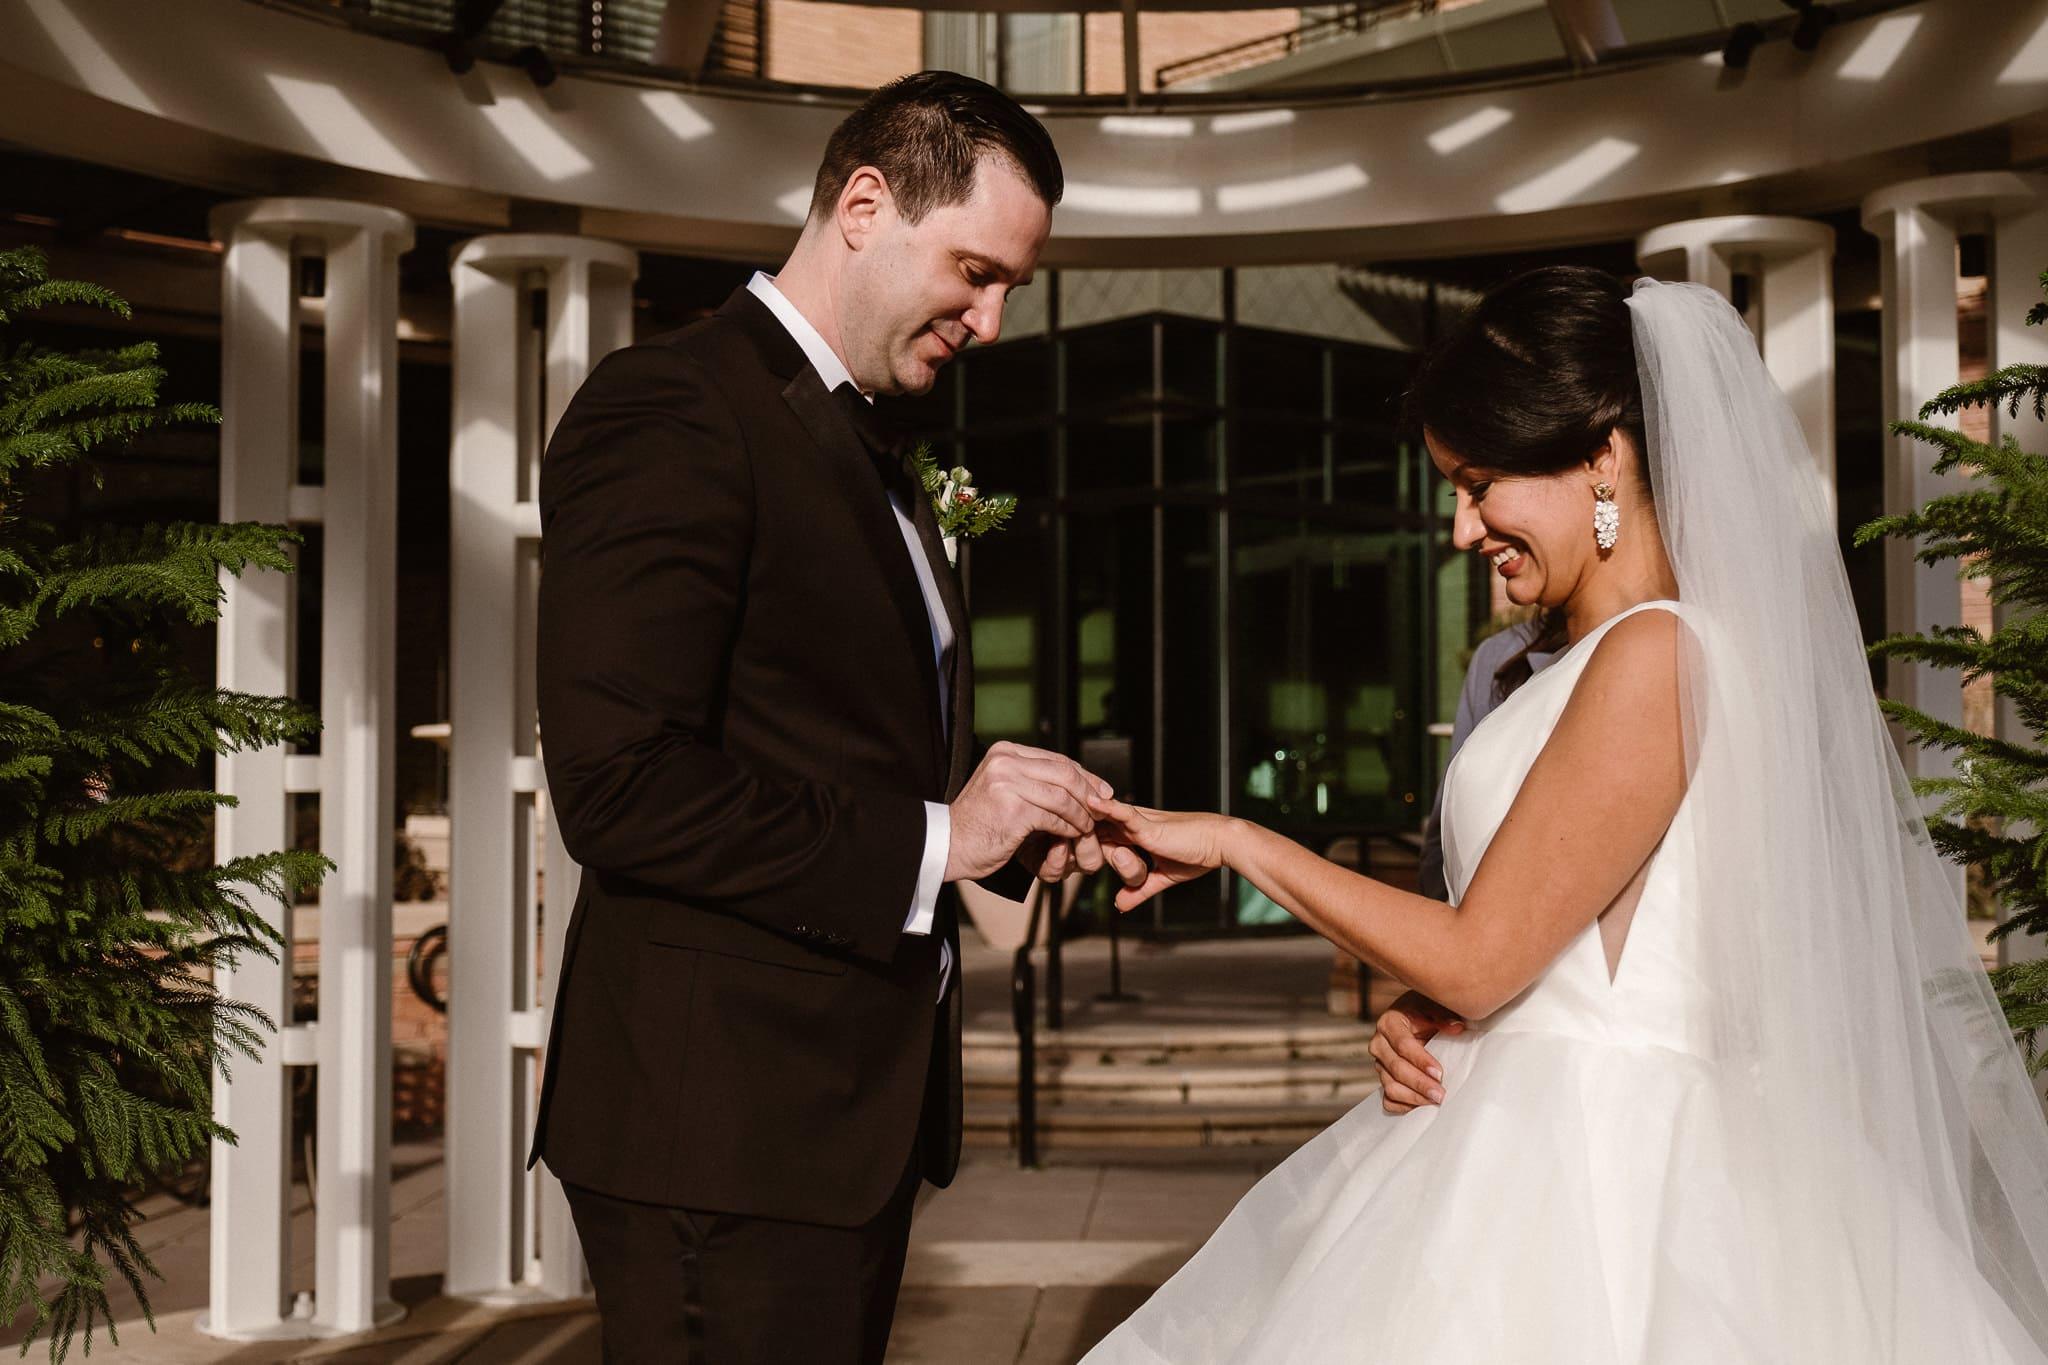 St Julien wedding photographer, The St Julien Hotel & Spa wedding ceremony in downtown Boulder, Boulder wedding photographer